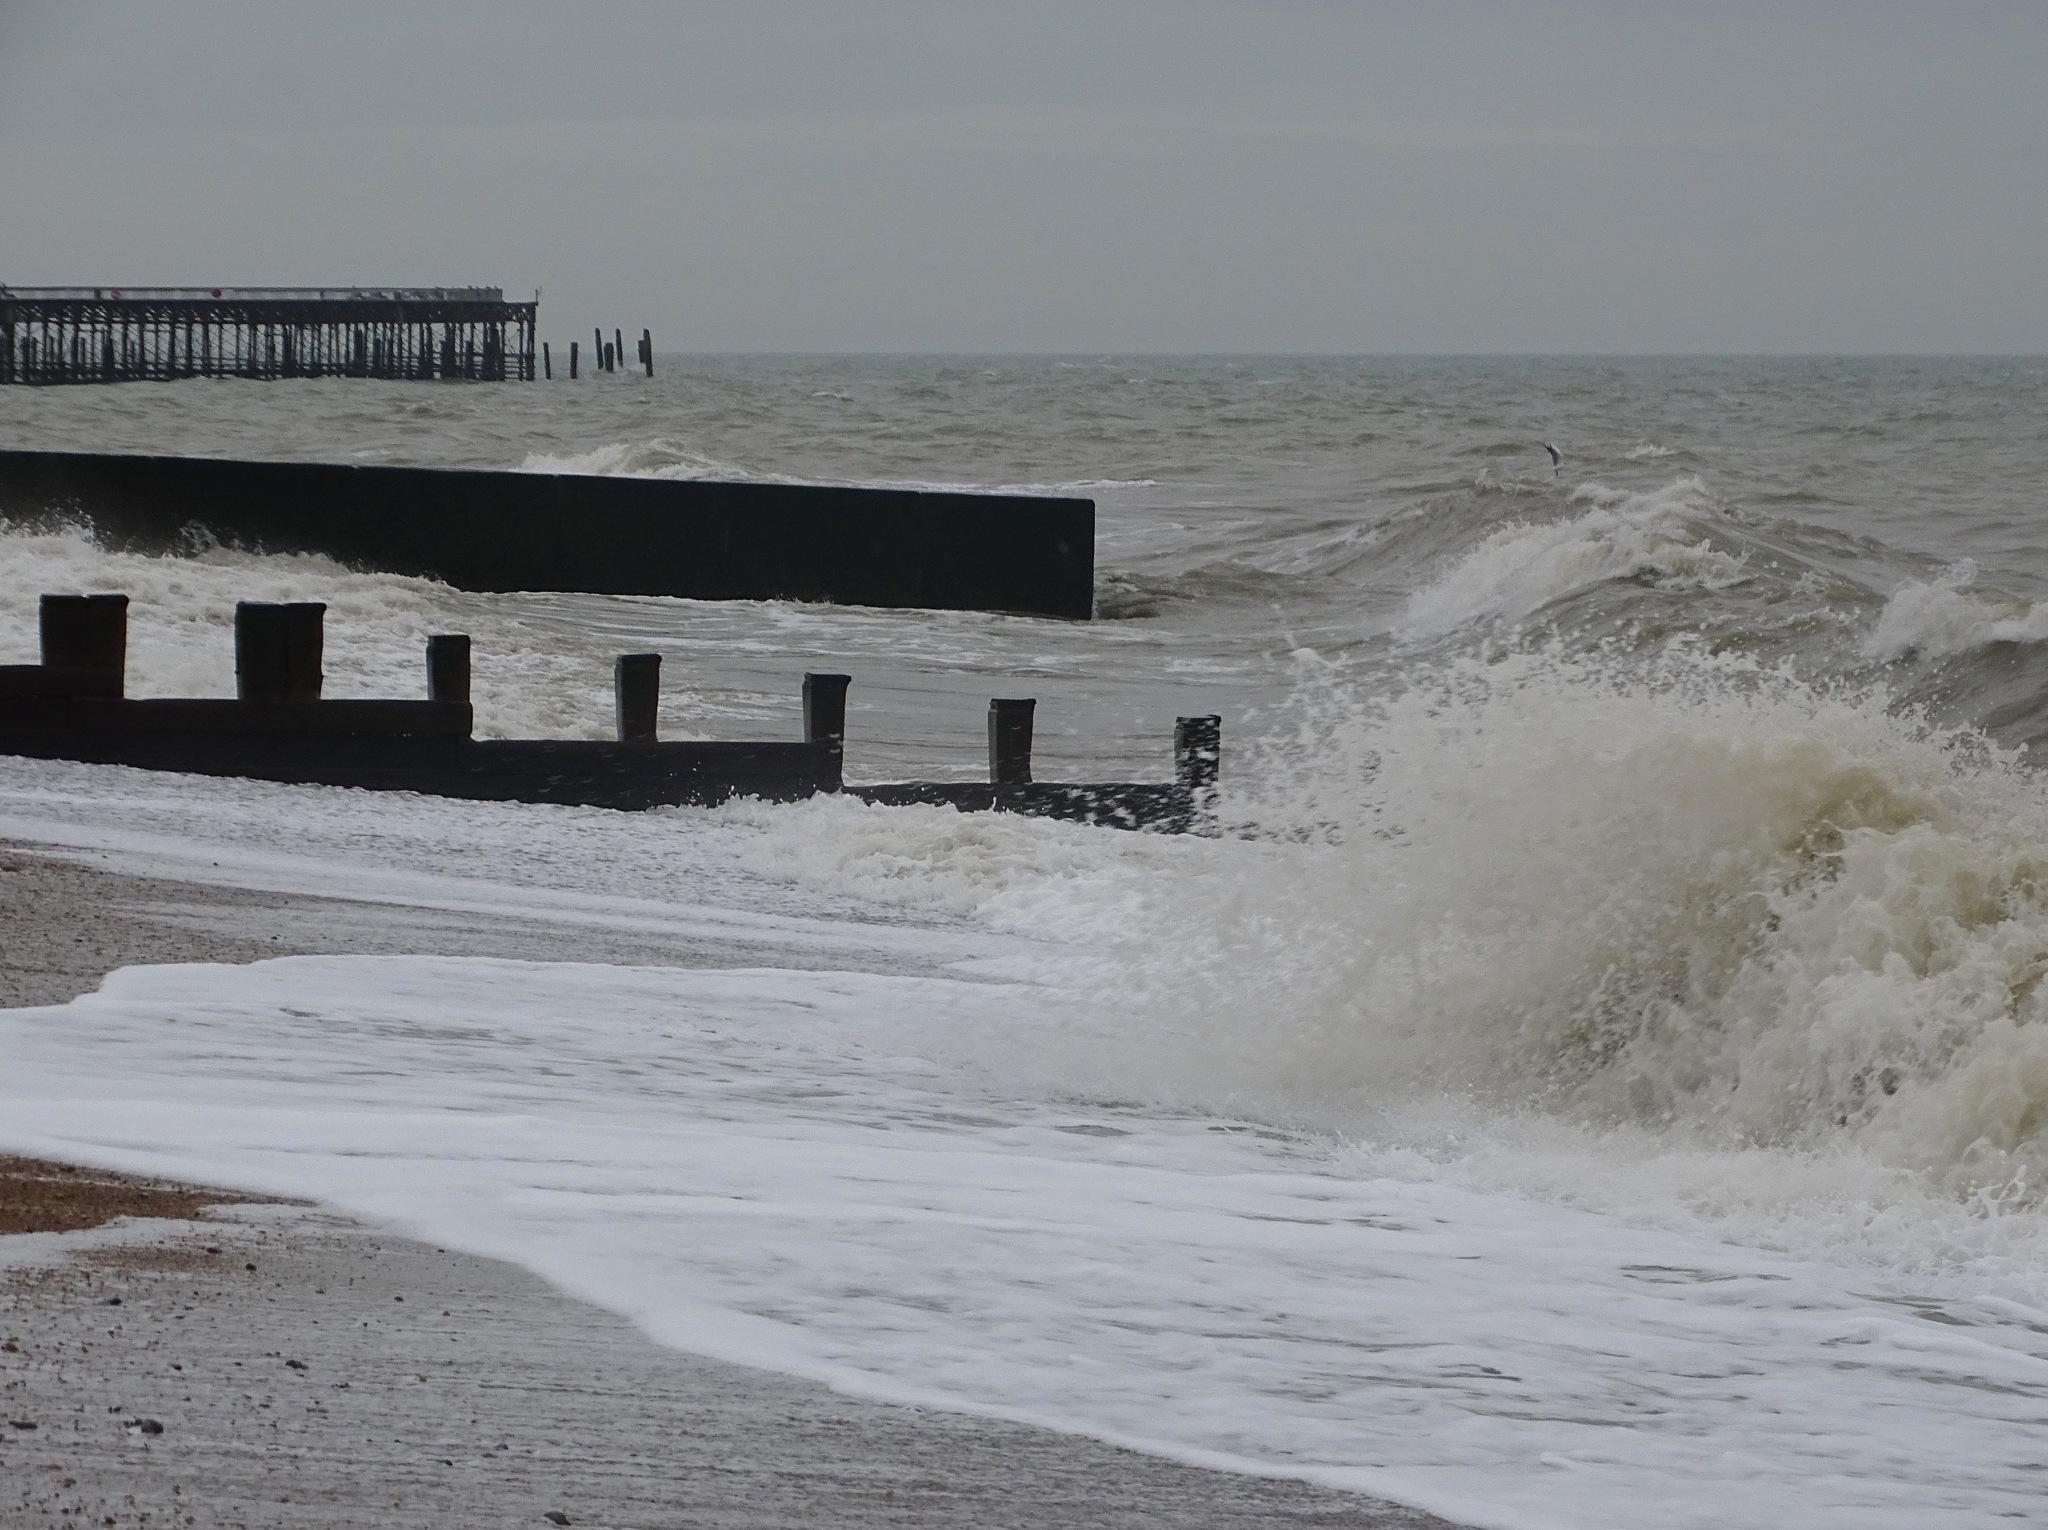 Waves at Hastings. by kayThornton